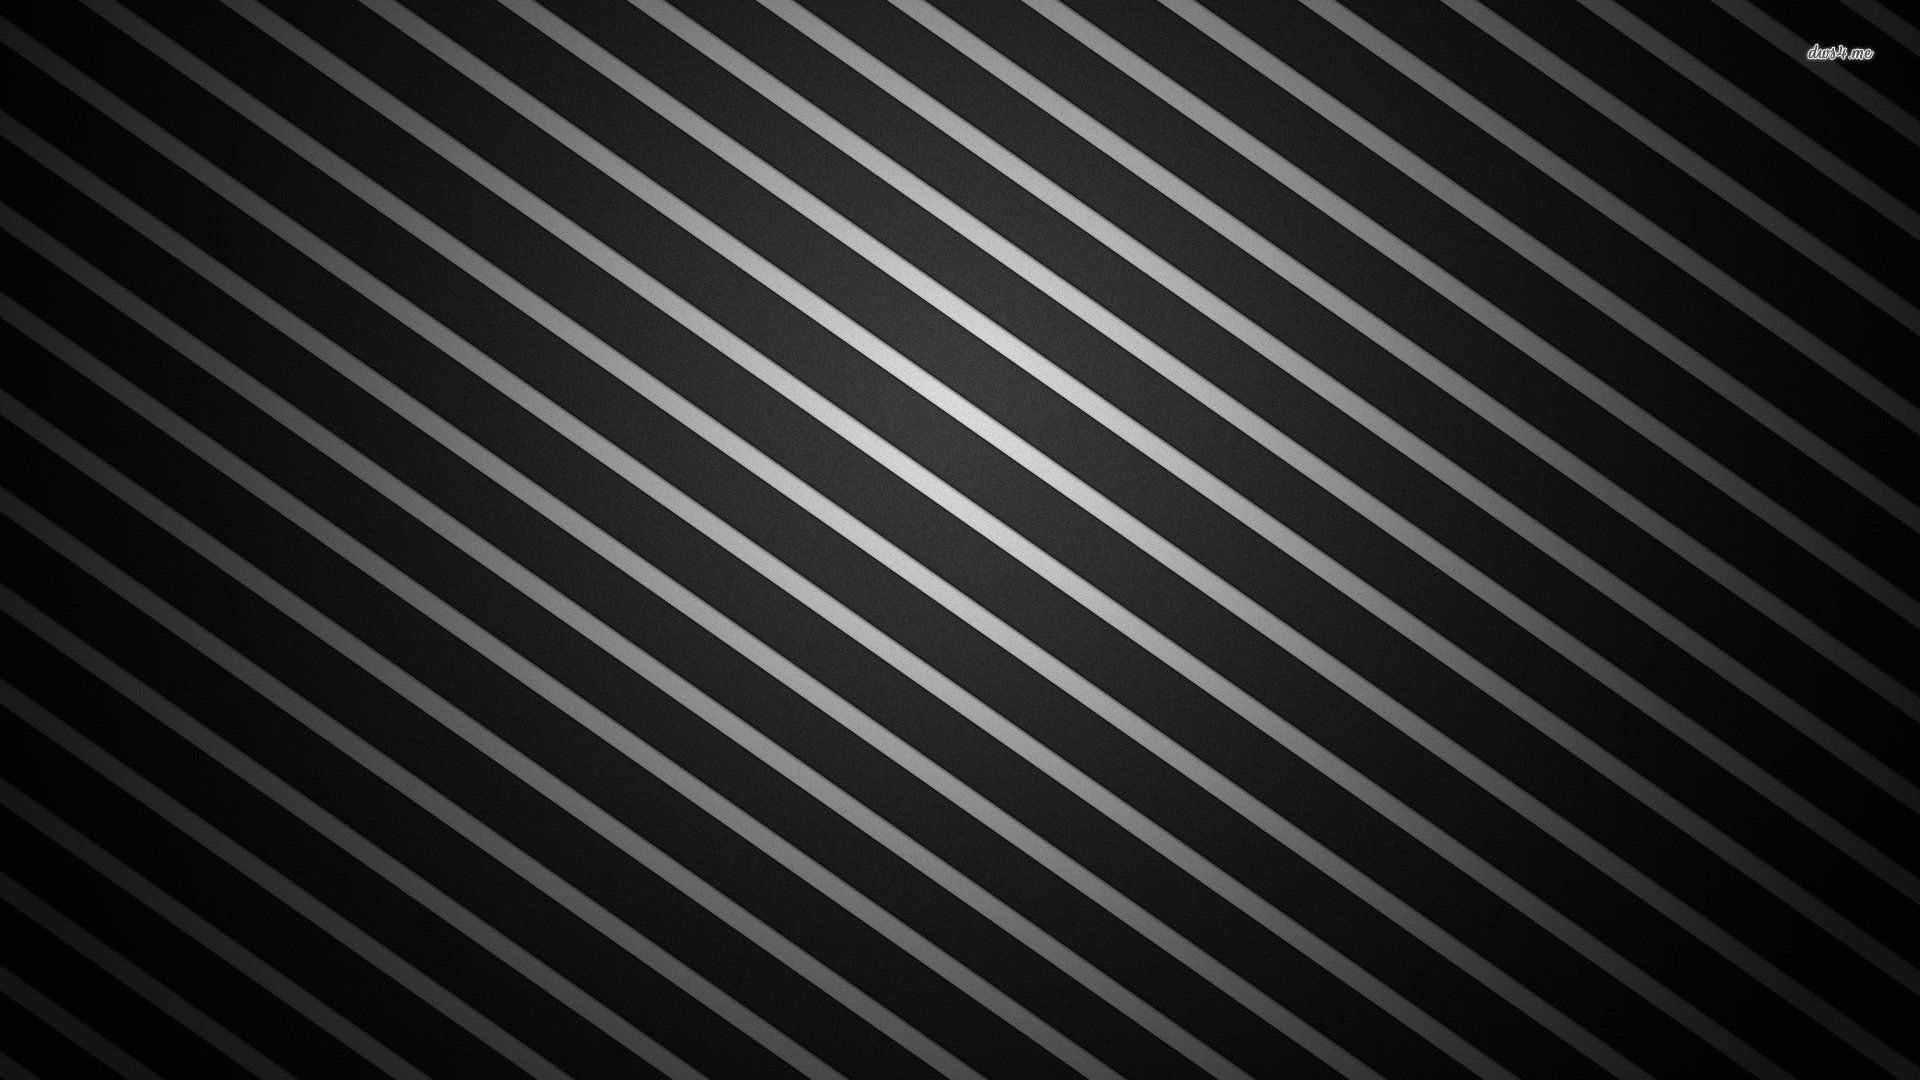 black silver hd wallpaper hd wallpapers pinterest silver wallpaper hd wallpaper and wallpaper